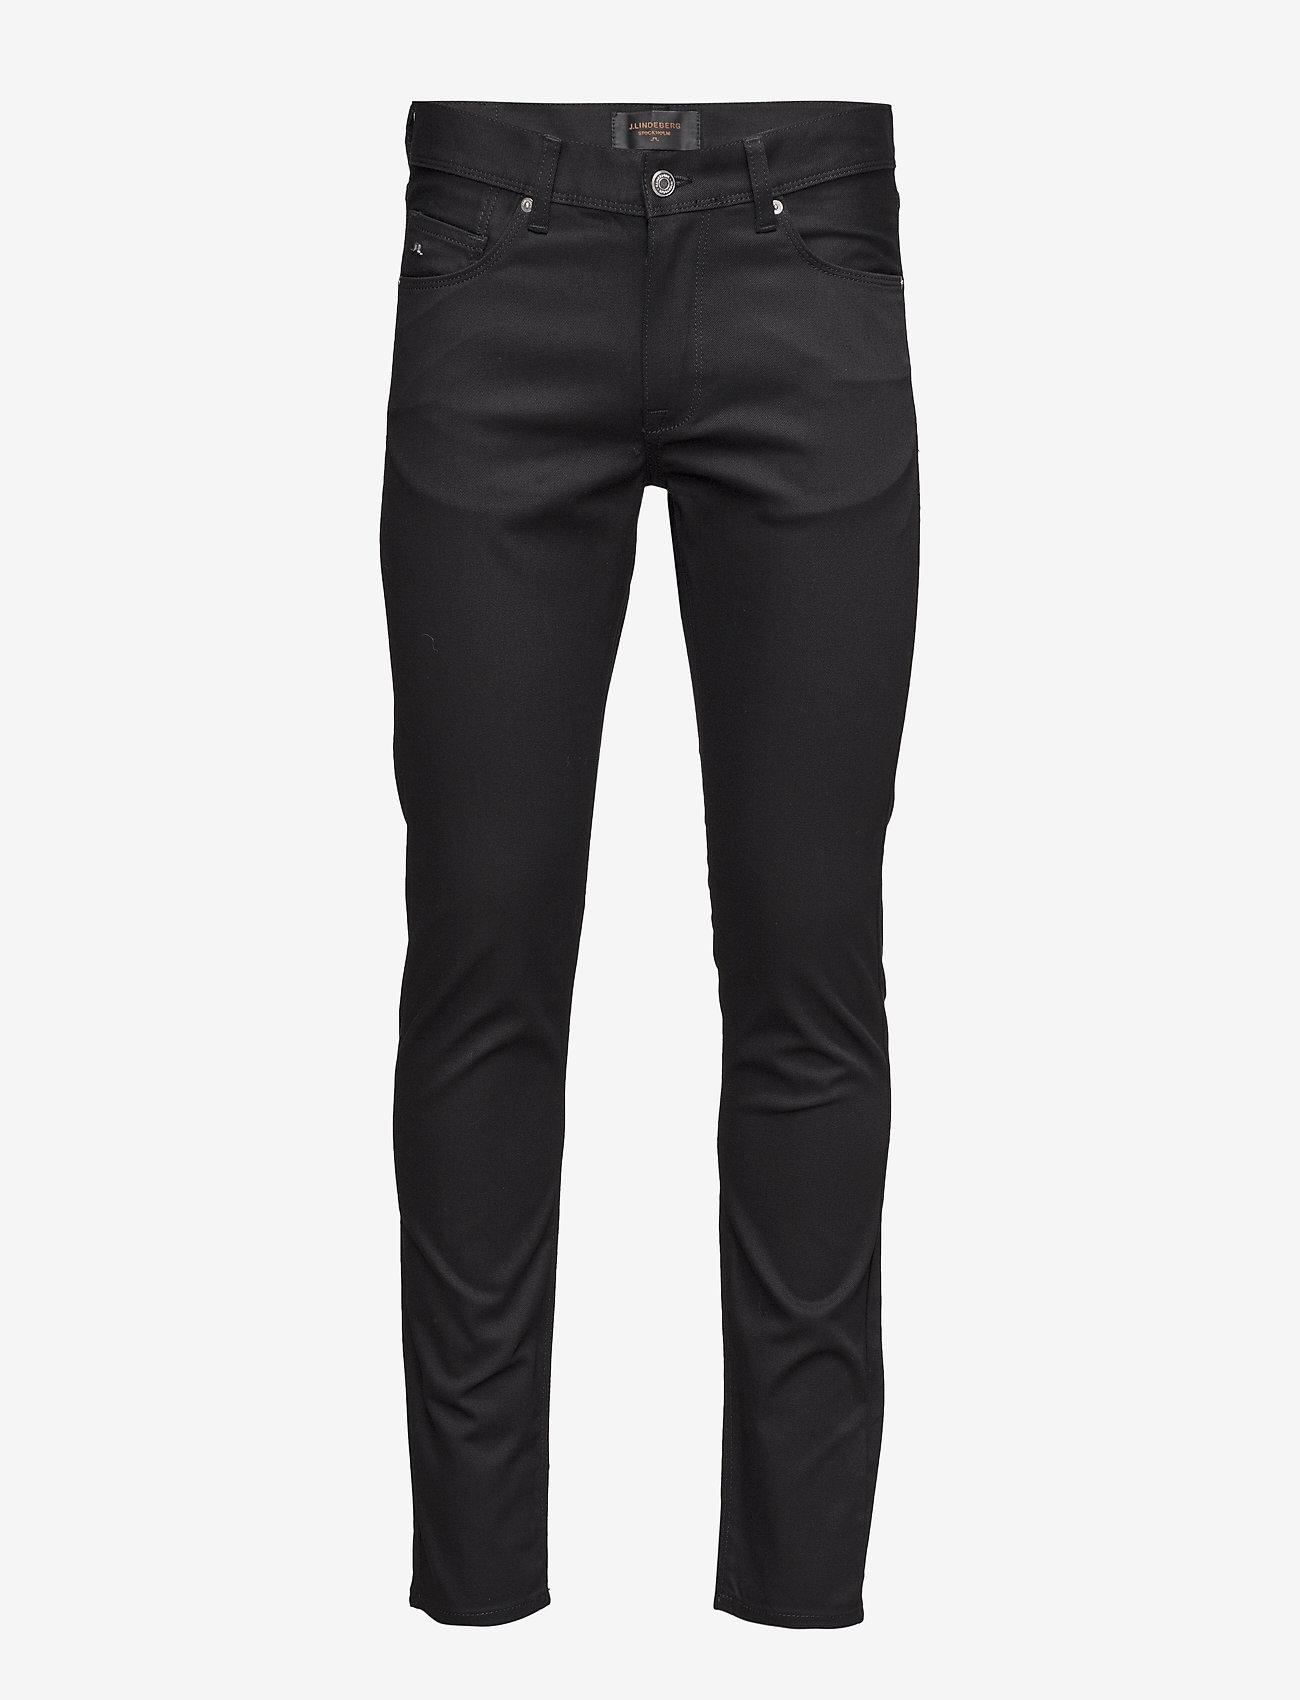 J. Lindeberg - Damien Black Stretch Denim - skinny jeans - black - 1